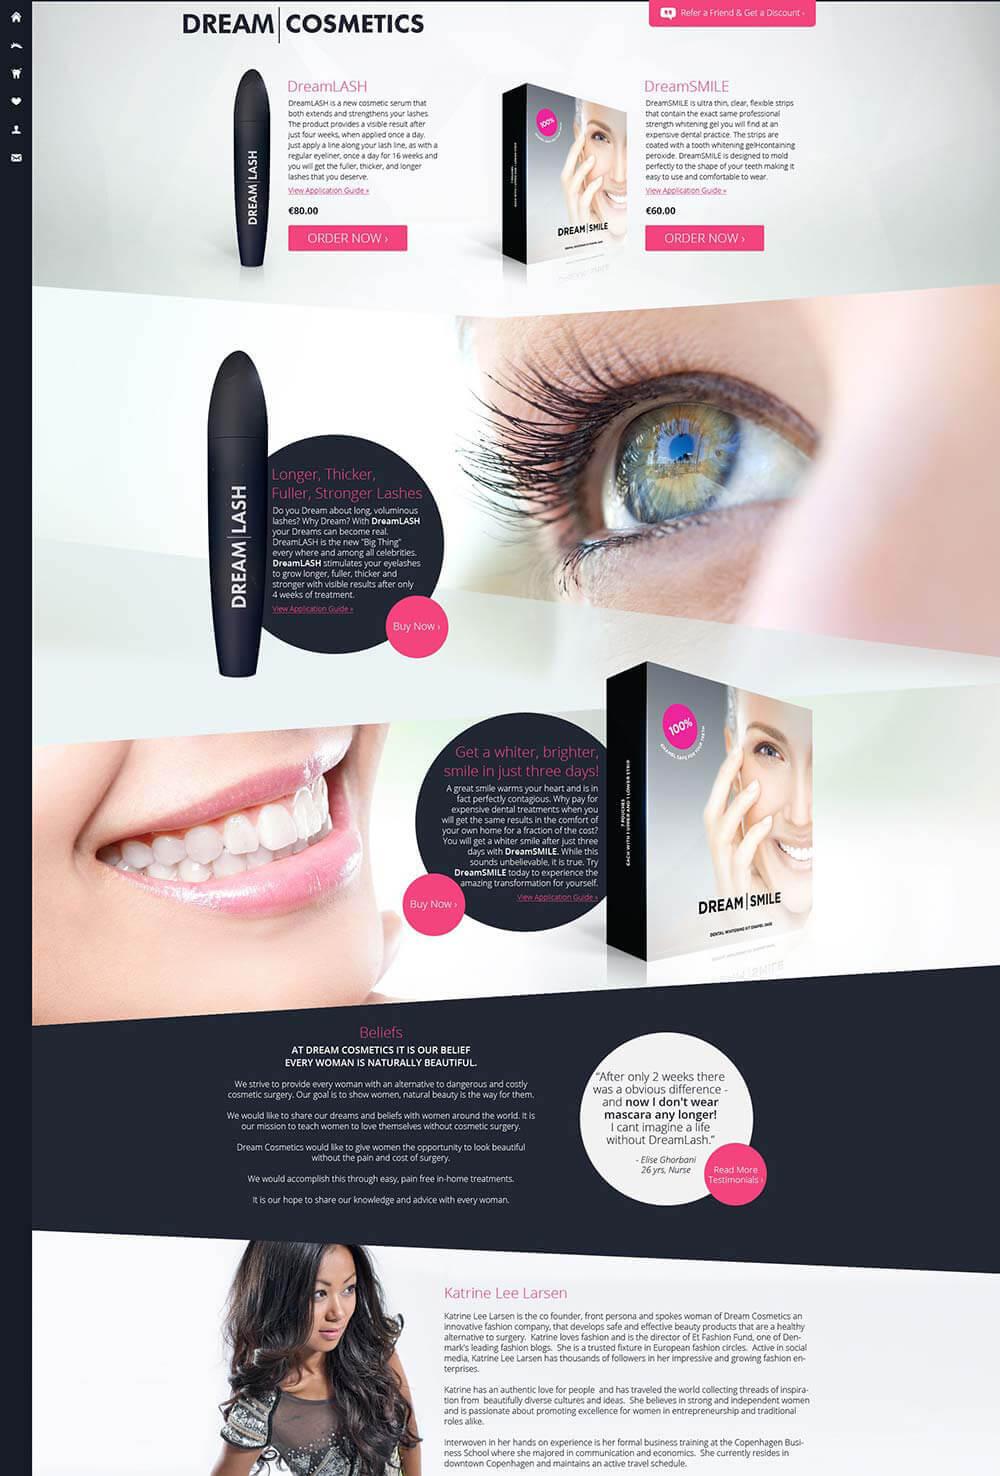 011_Dream-Cosmetics_Home_FINAL